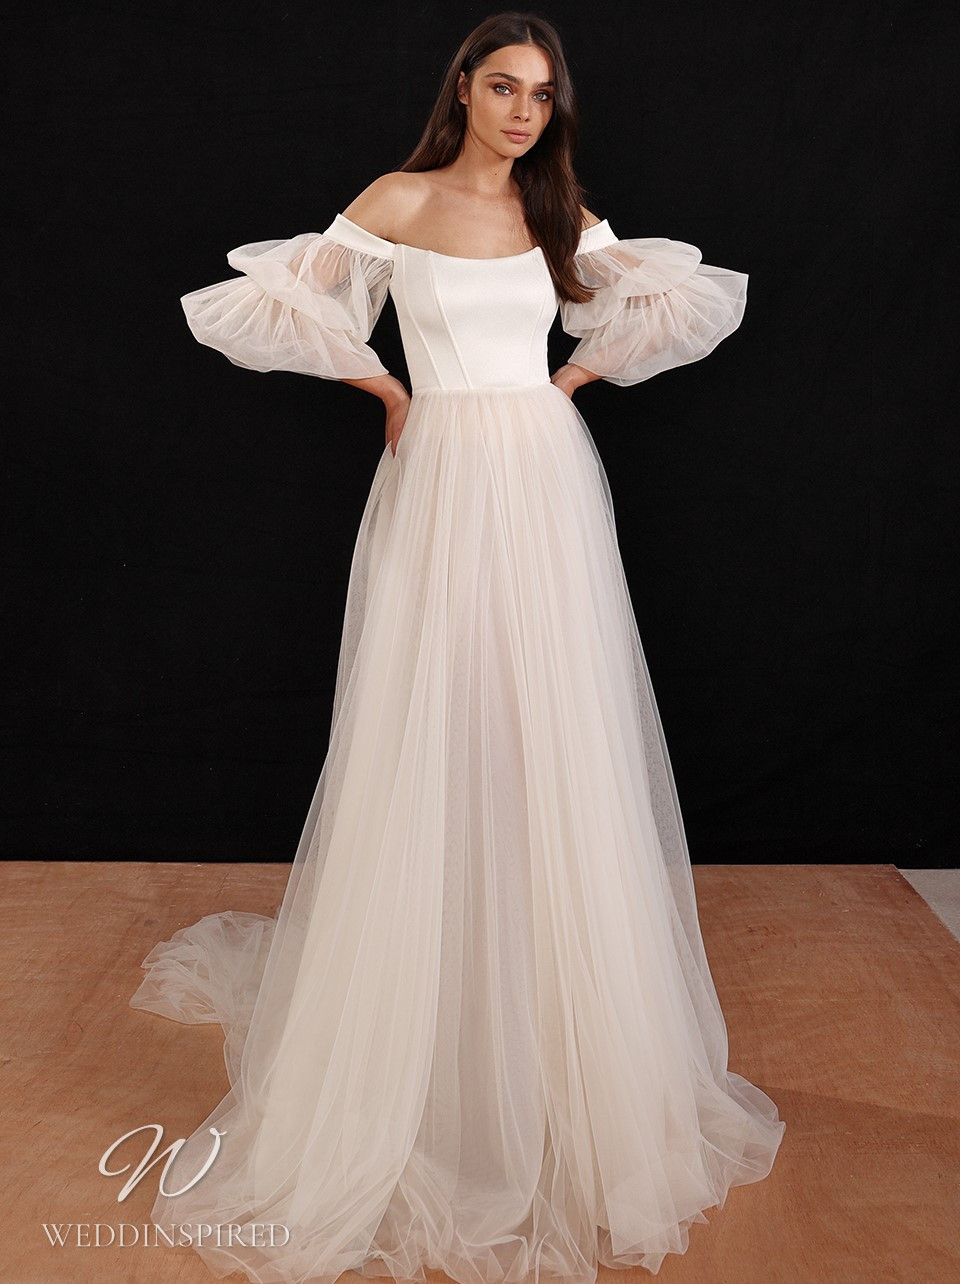 A Galia Lahav 2022 off the shoulder bohemian tulle A-line wedding dress